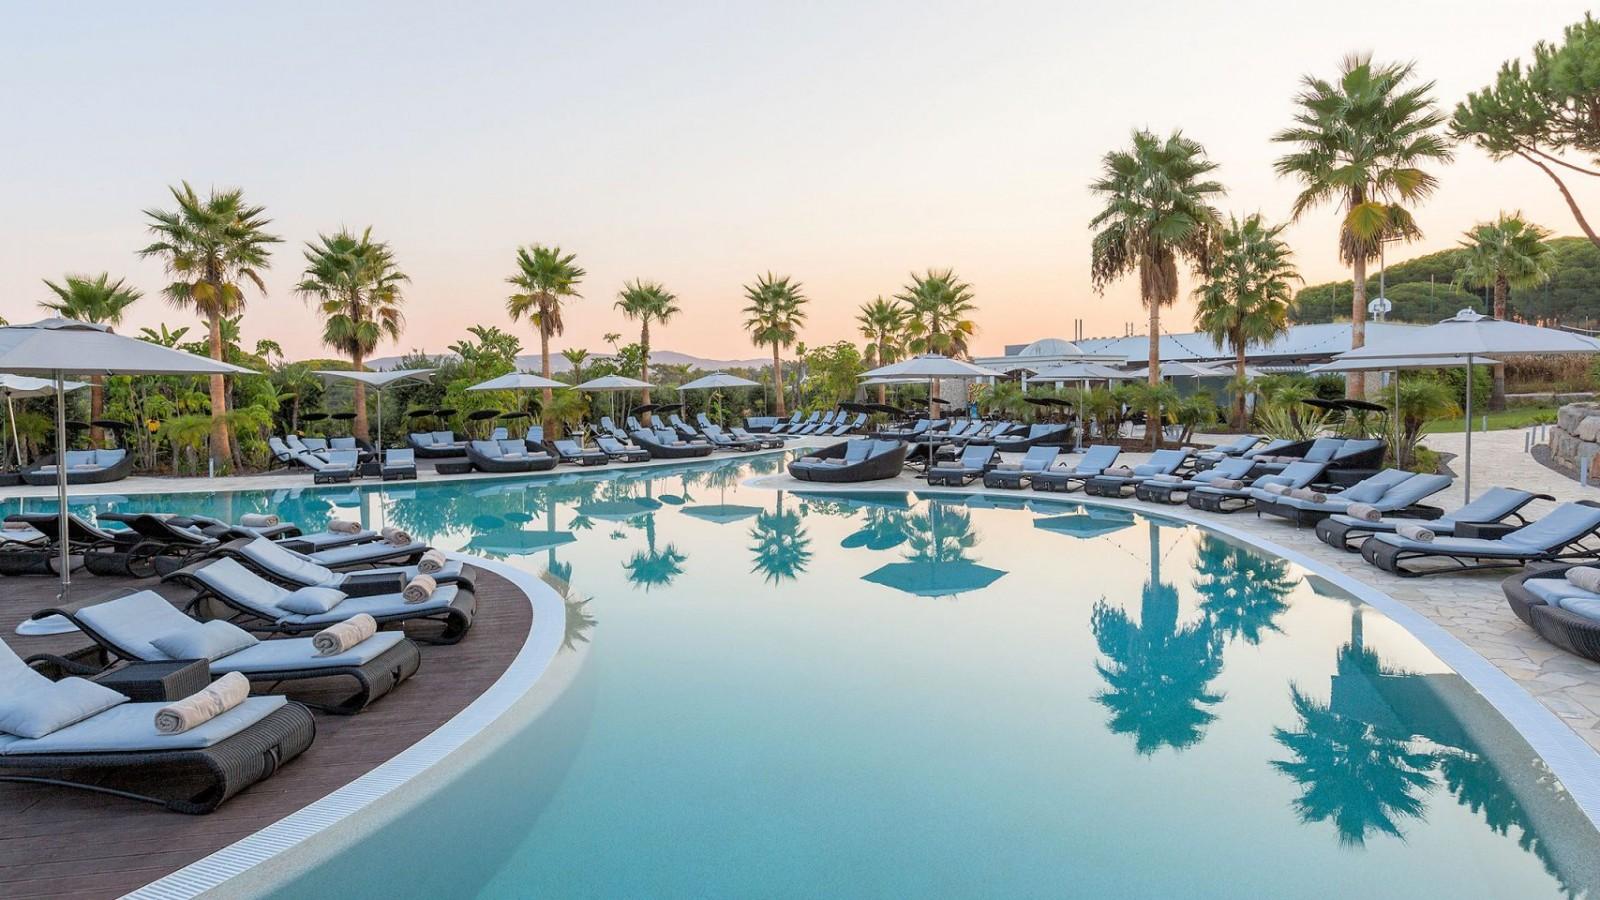 Conrad Algarve Pool View